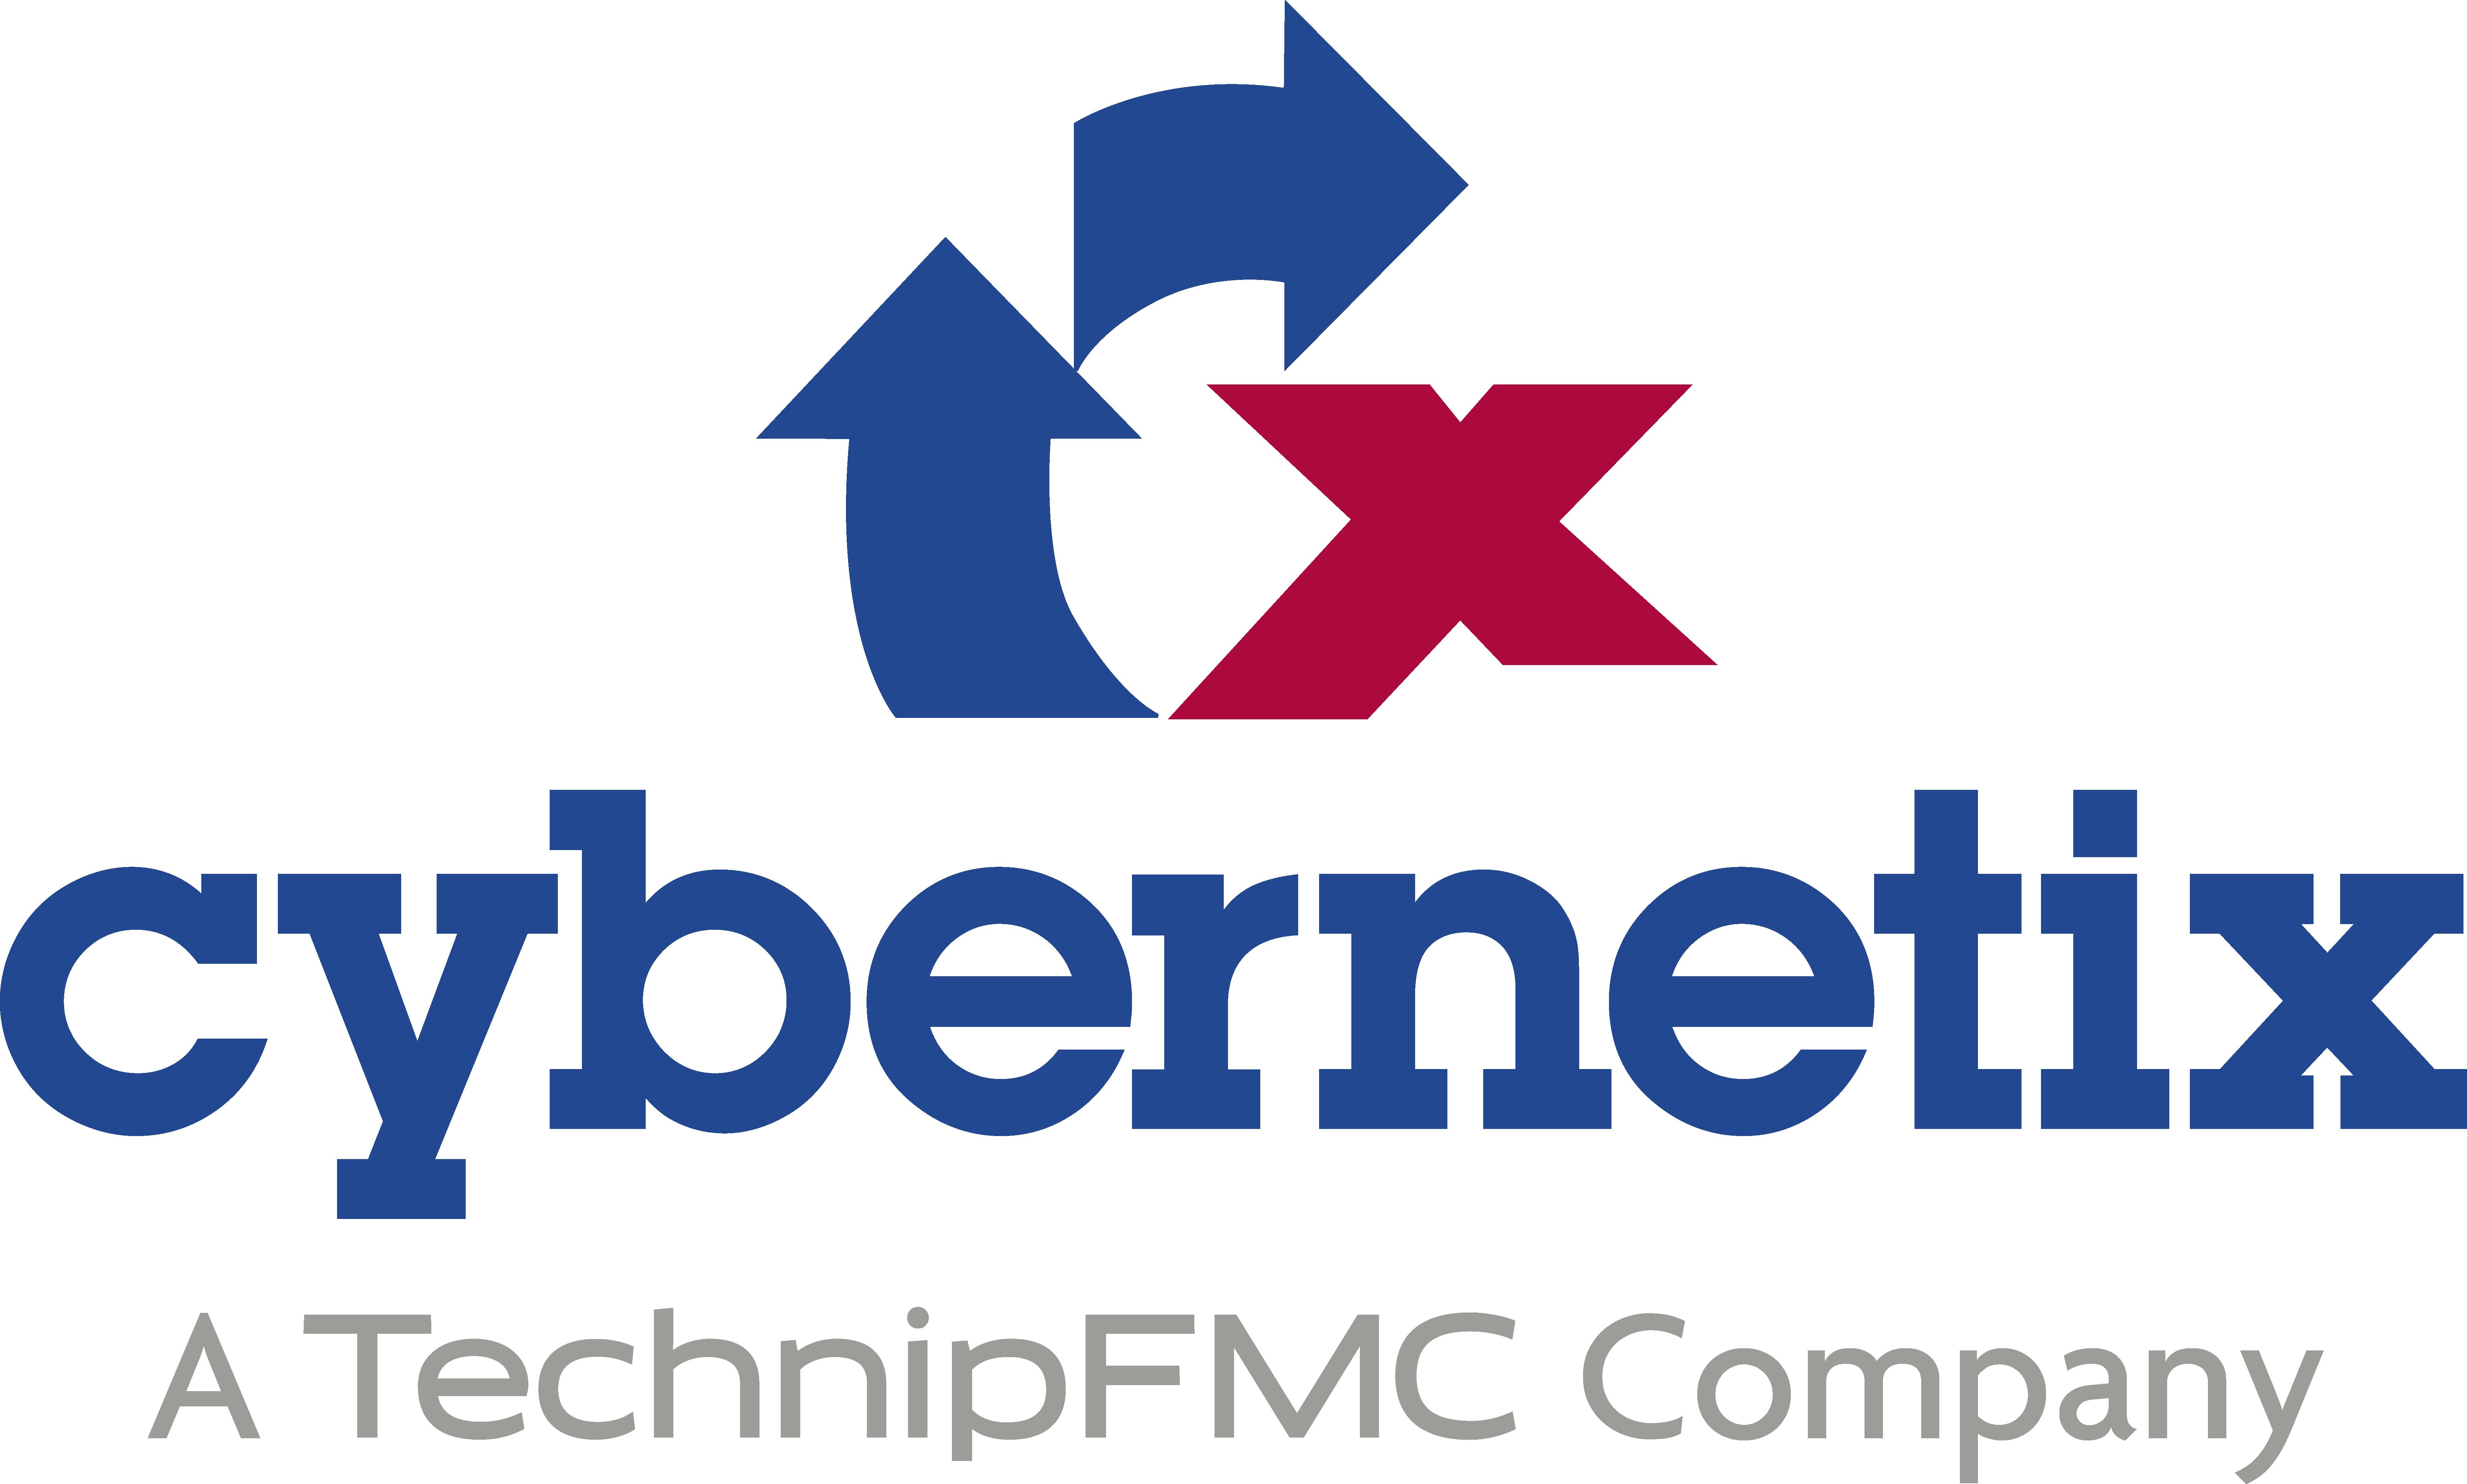 Cybernetix SRIS Ltd